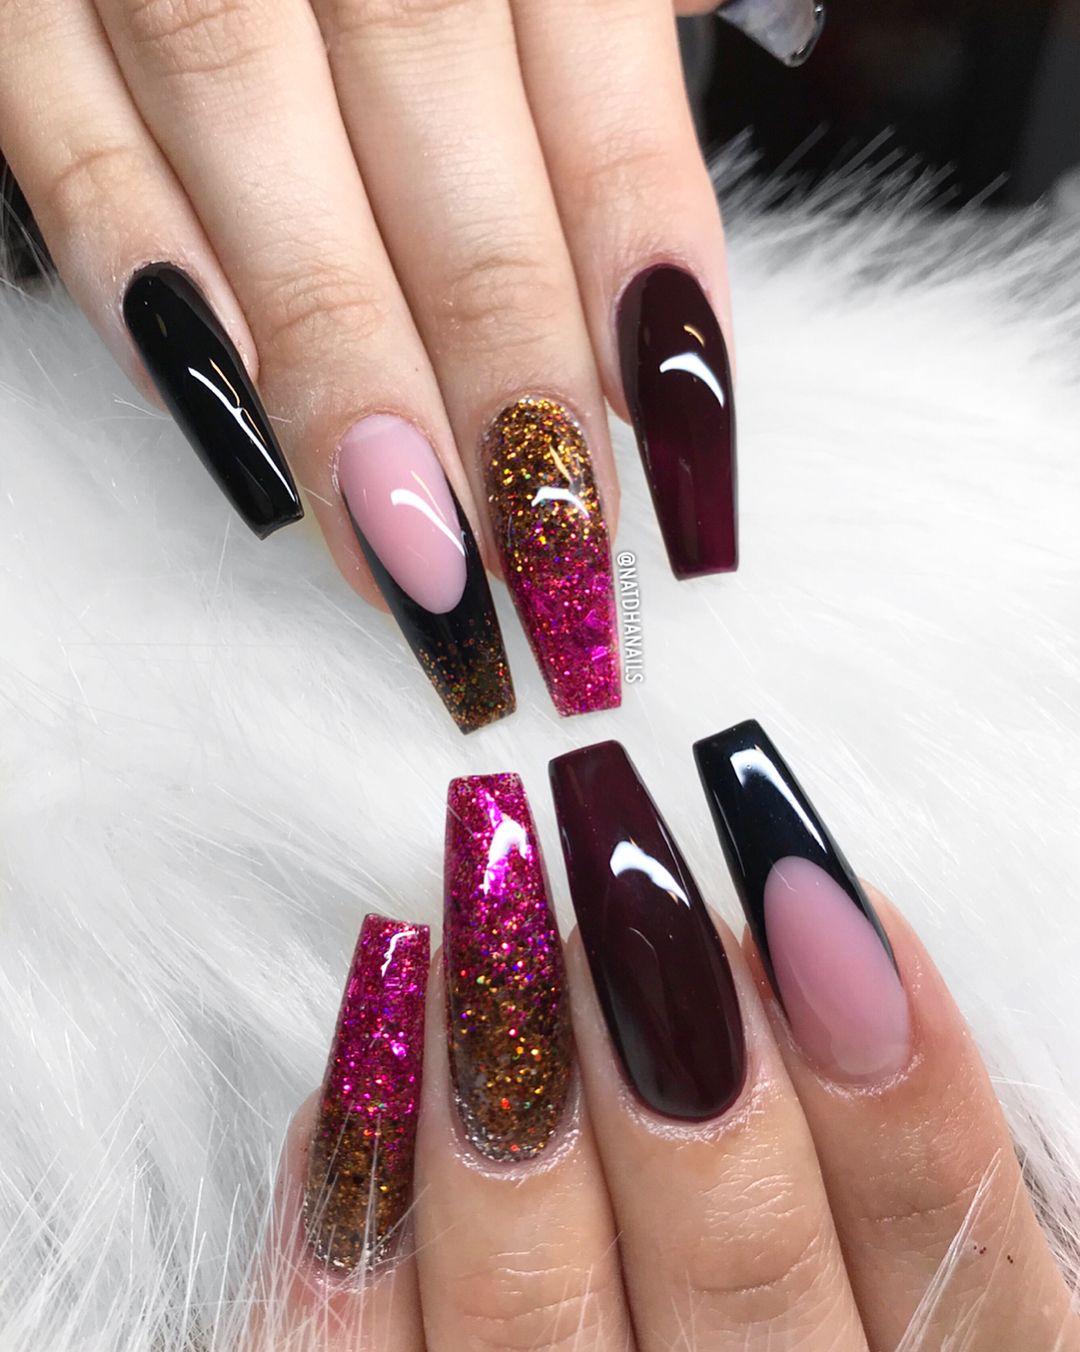 Pin by Kelanie Redmond on Make-Up & Nails | Make-Up & Nails ...